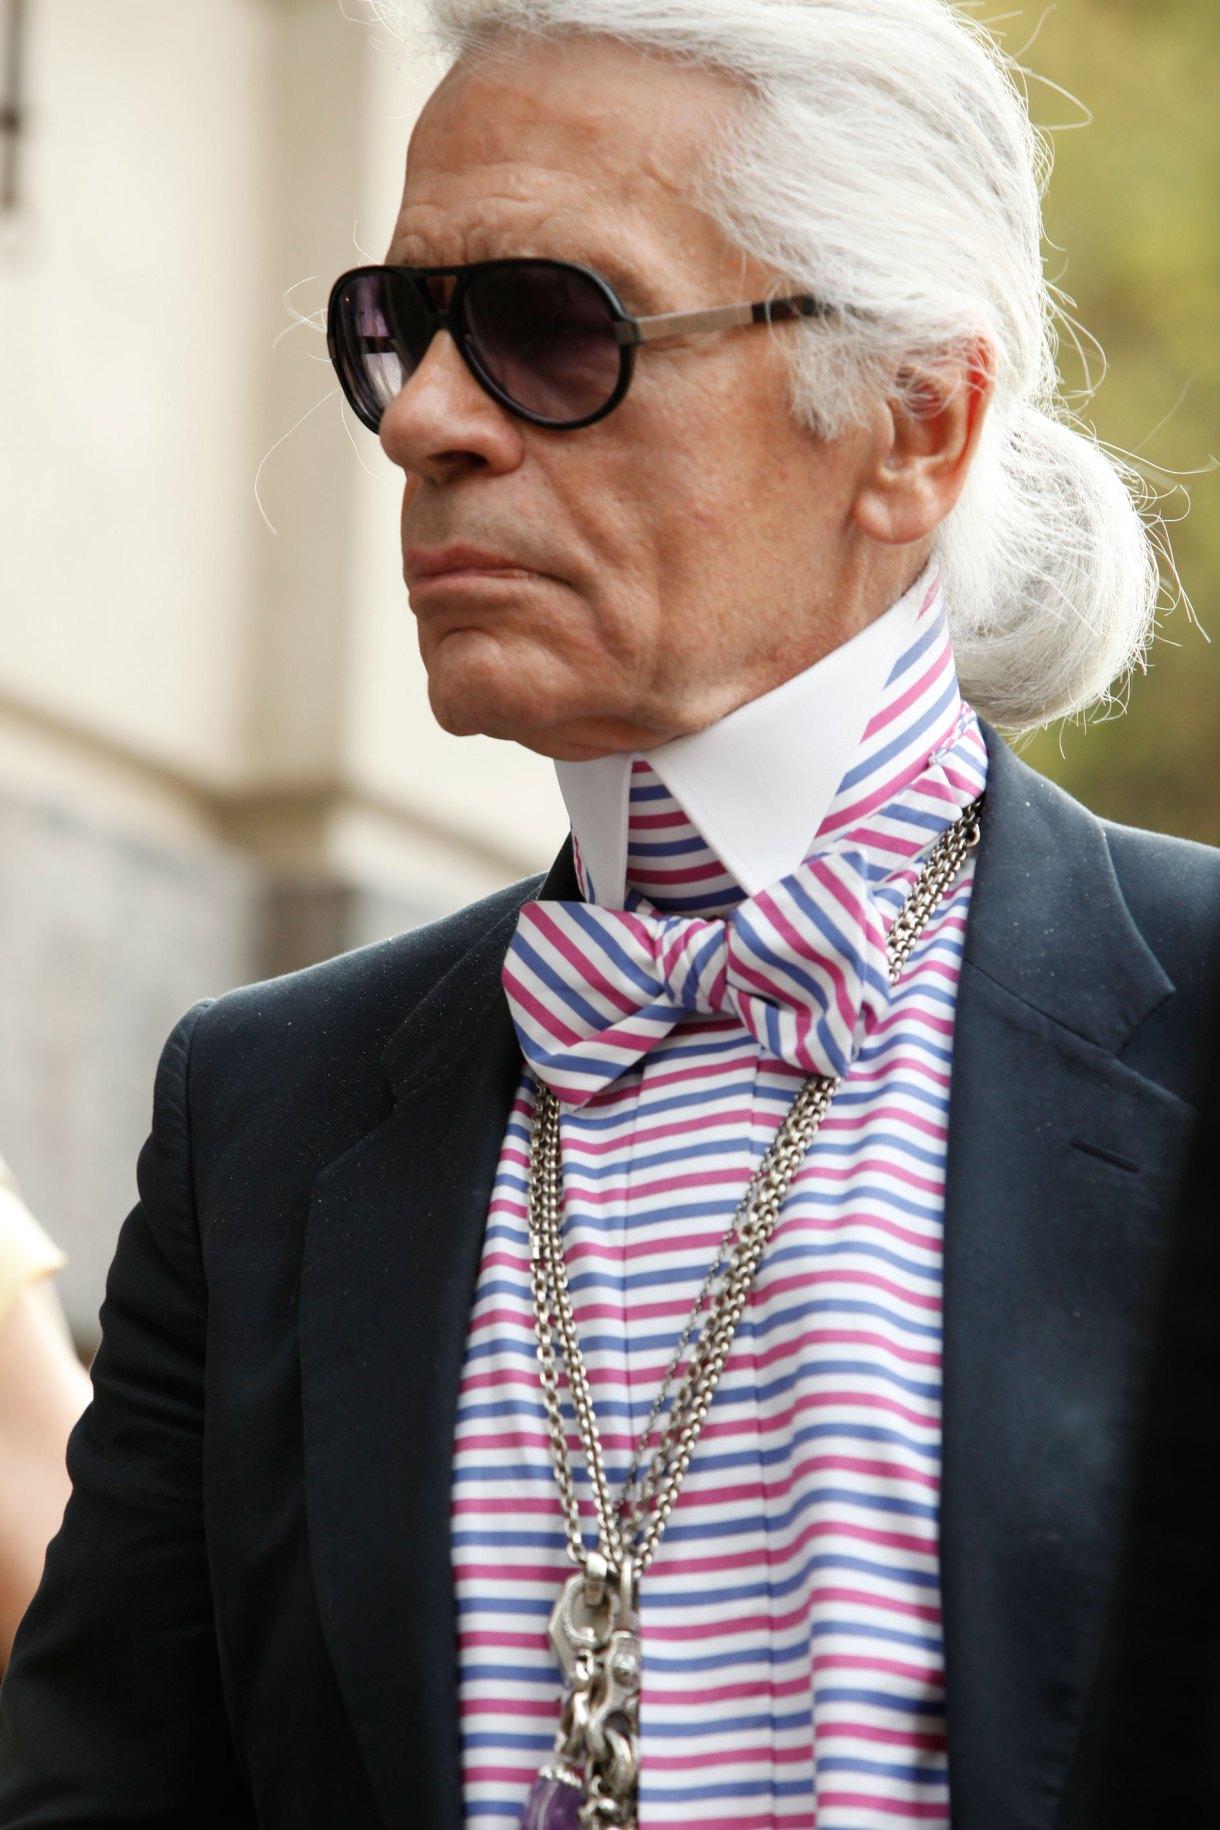 A los 85 años murió Karl Lagerfeld